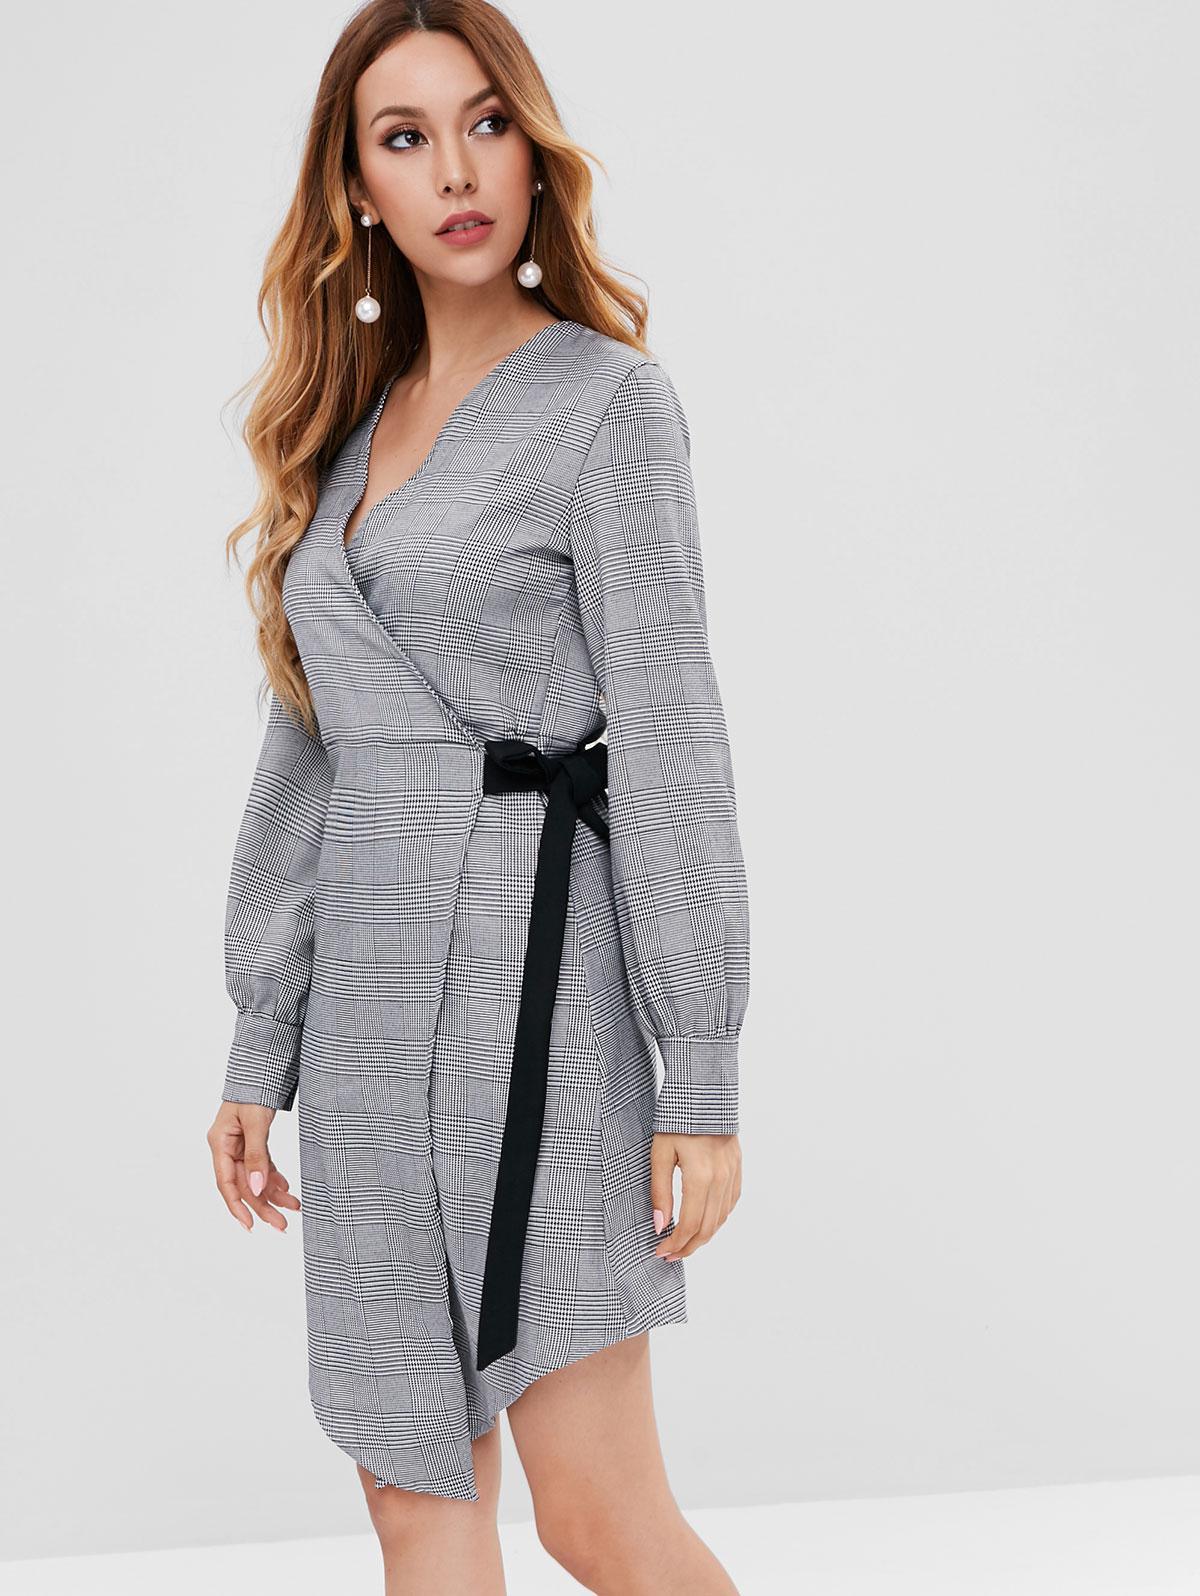 Long Sleeve Houndstooth Plaid Wrap Dress